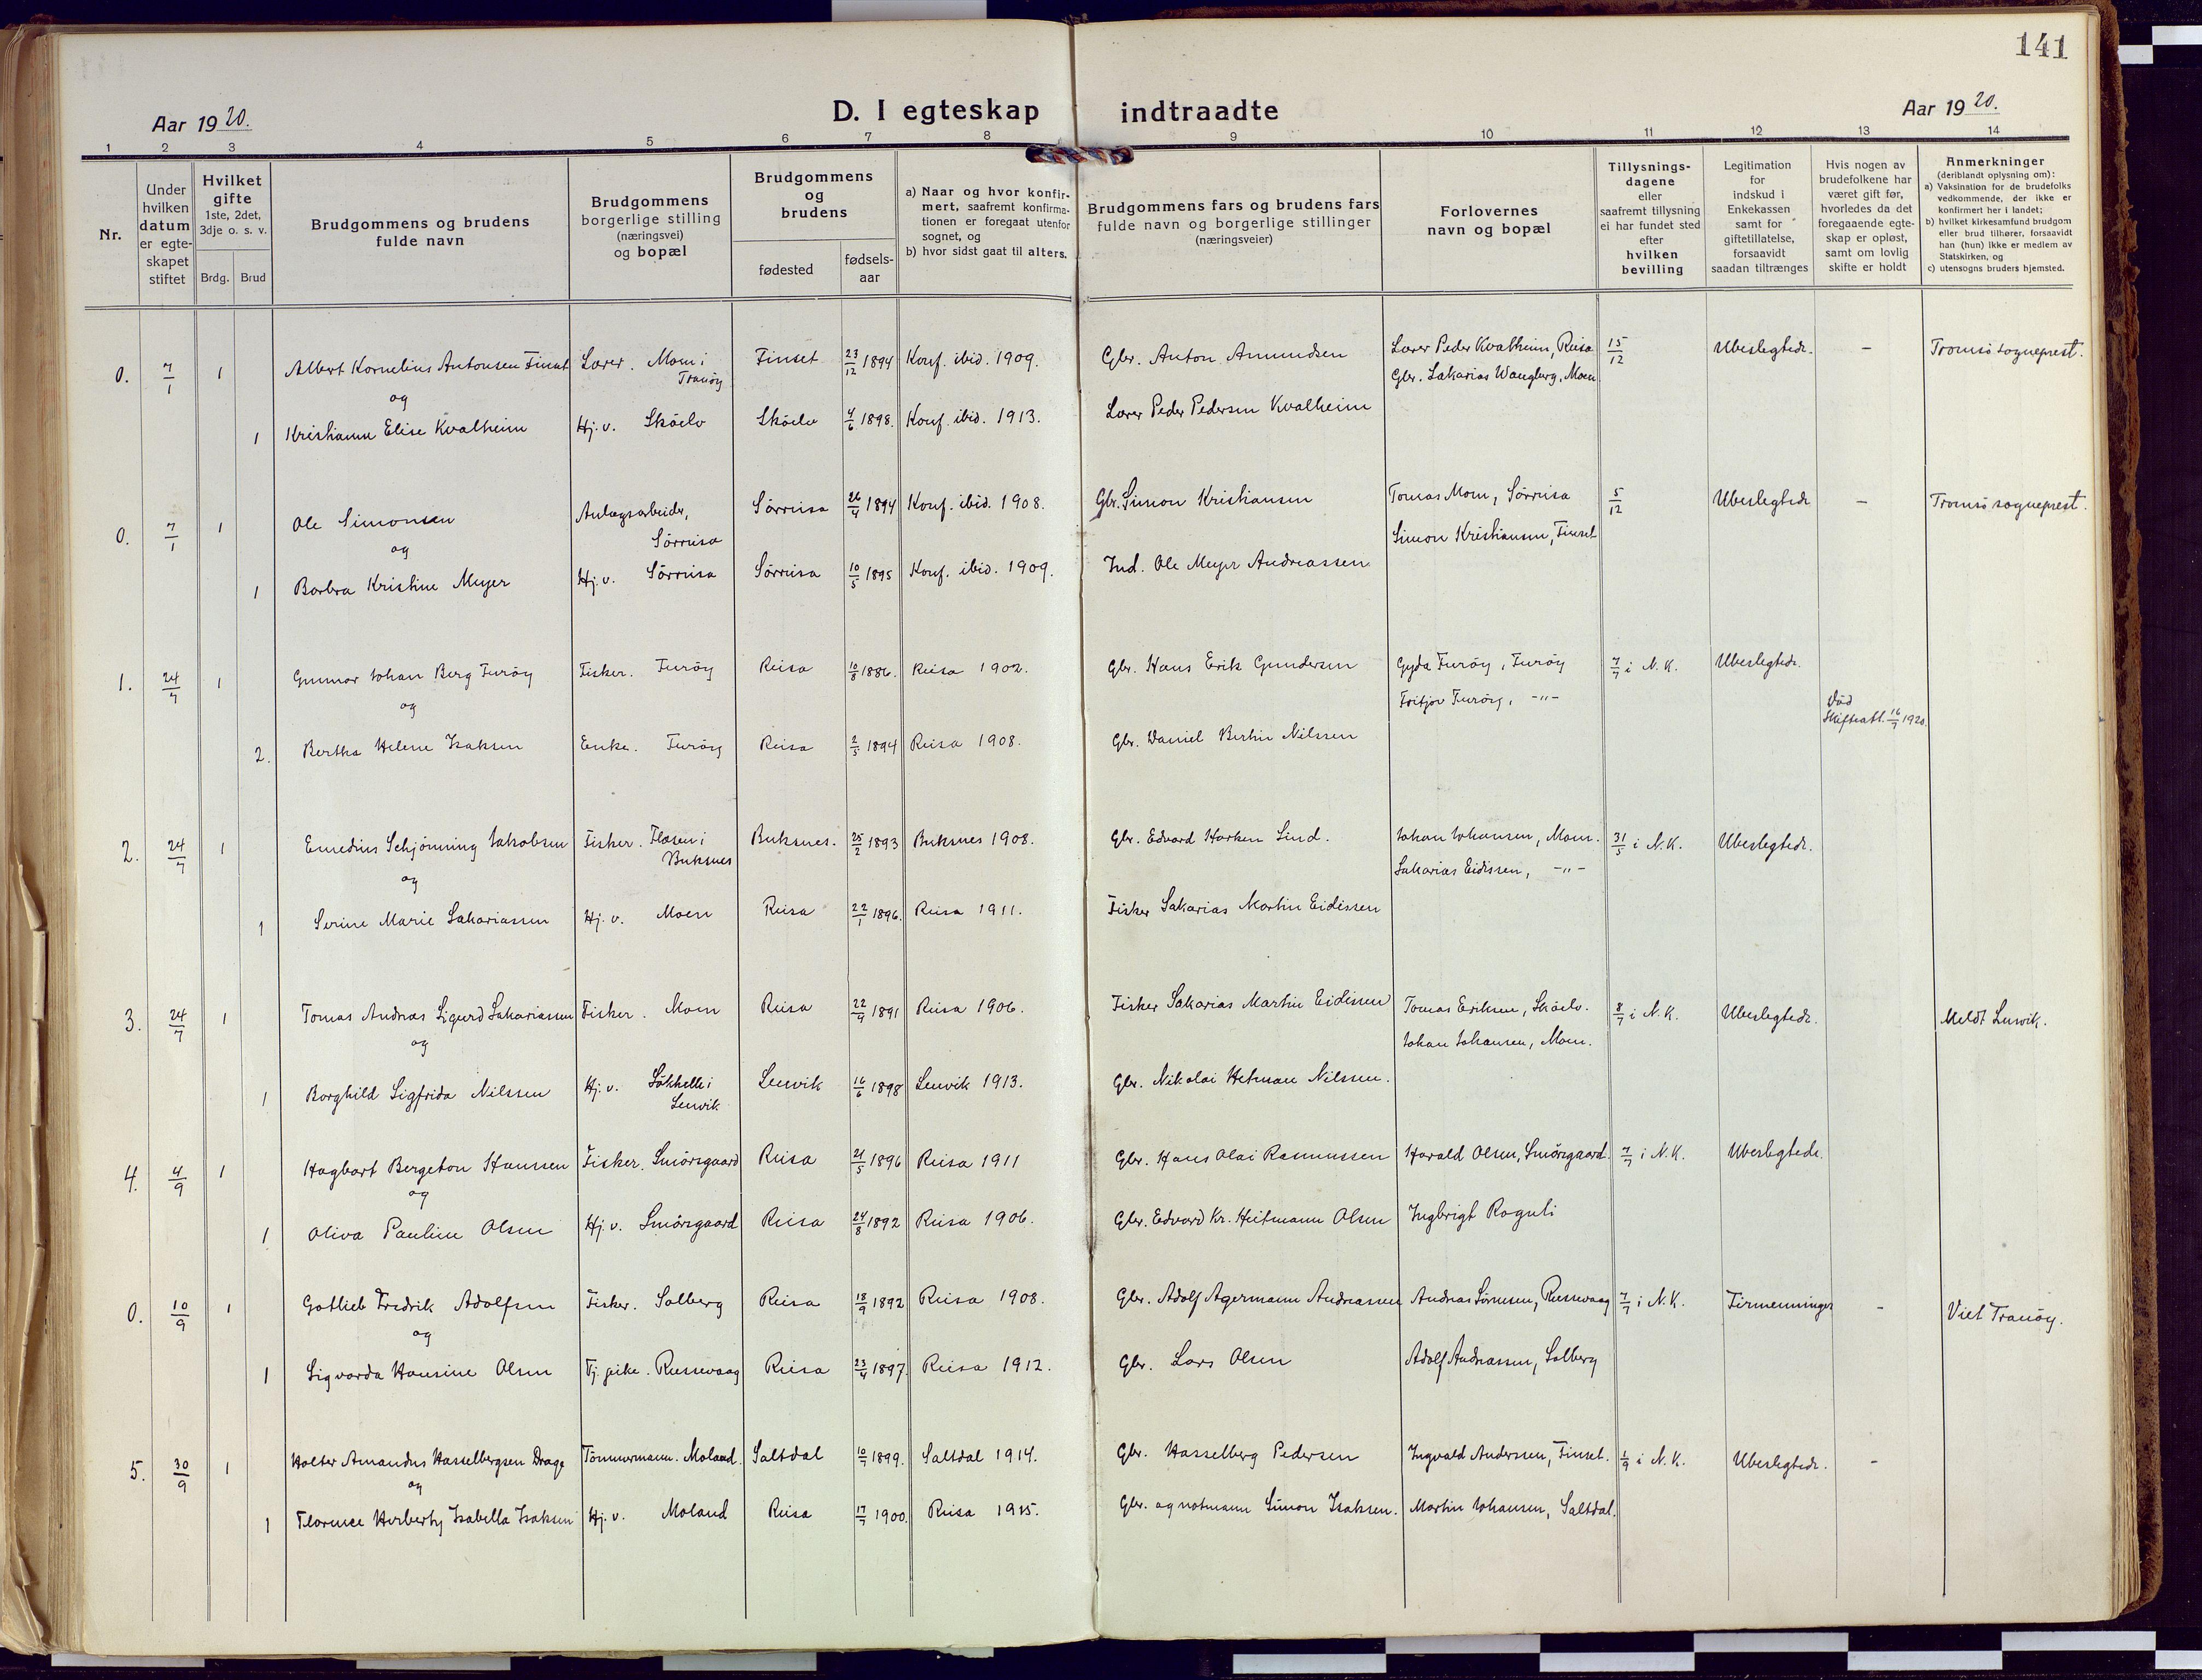 SATØ, Tranøy sokneprestkontor, I/Ia/Iaa/L0015kirke: Ministerialbok nr. 15, 1919-1928, s. 141